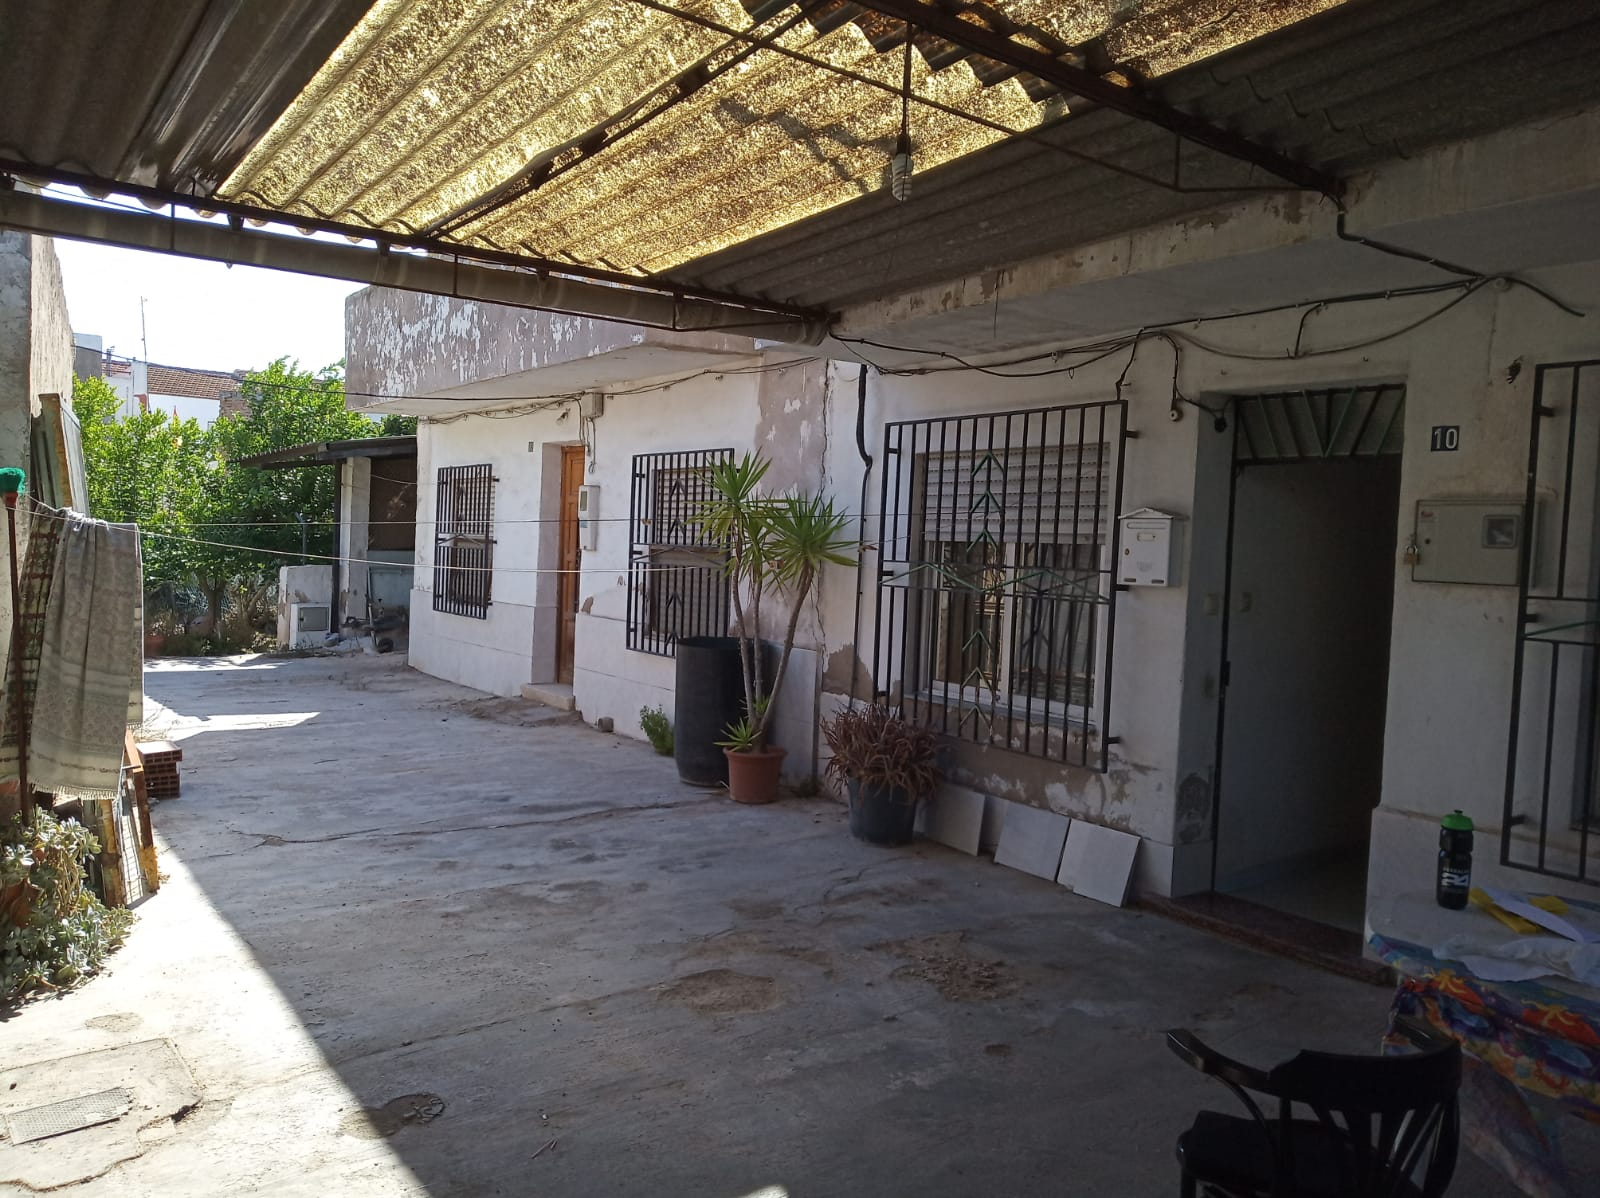 Casa con Terreno en Aljucer